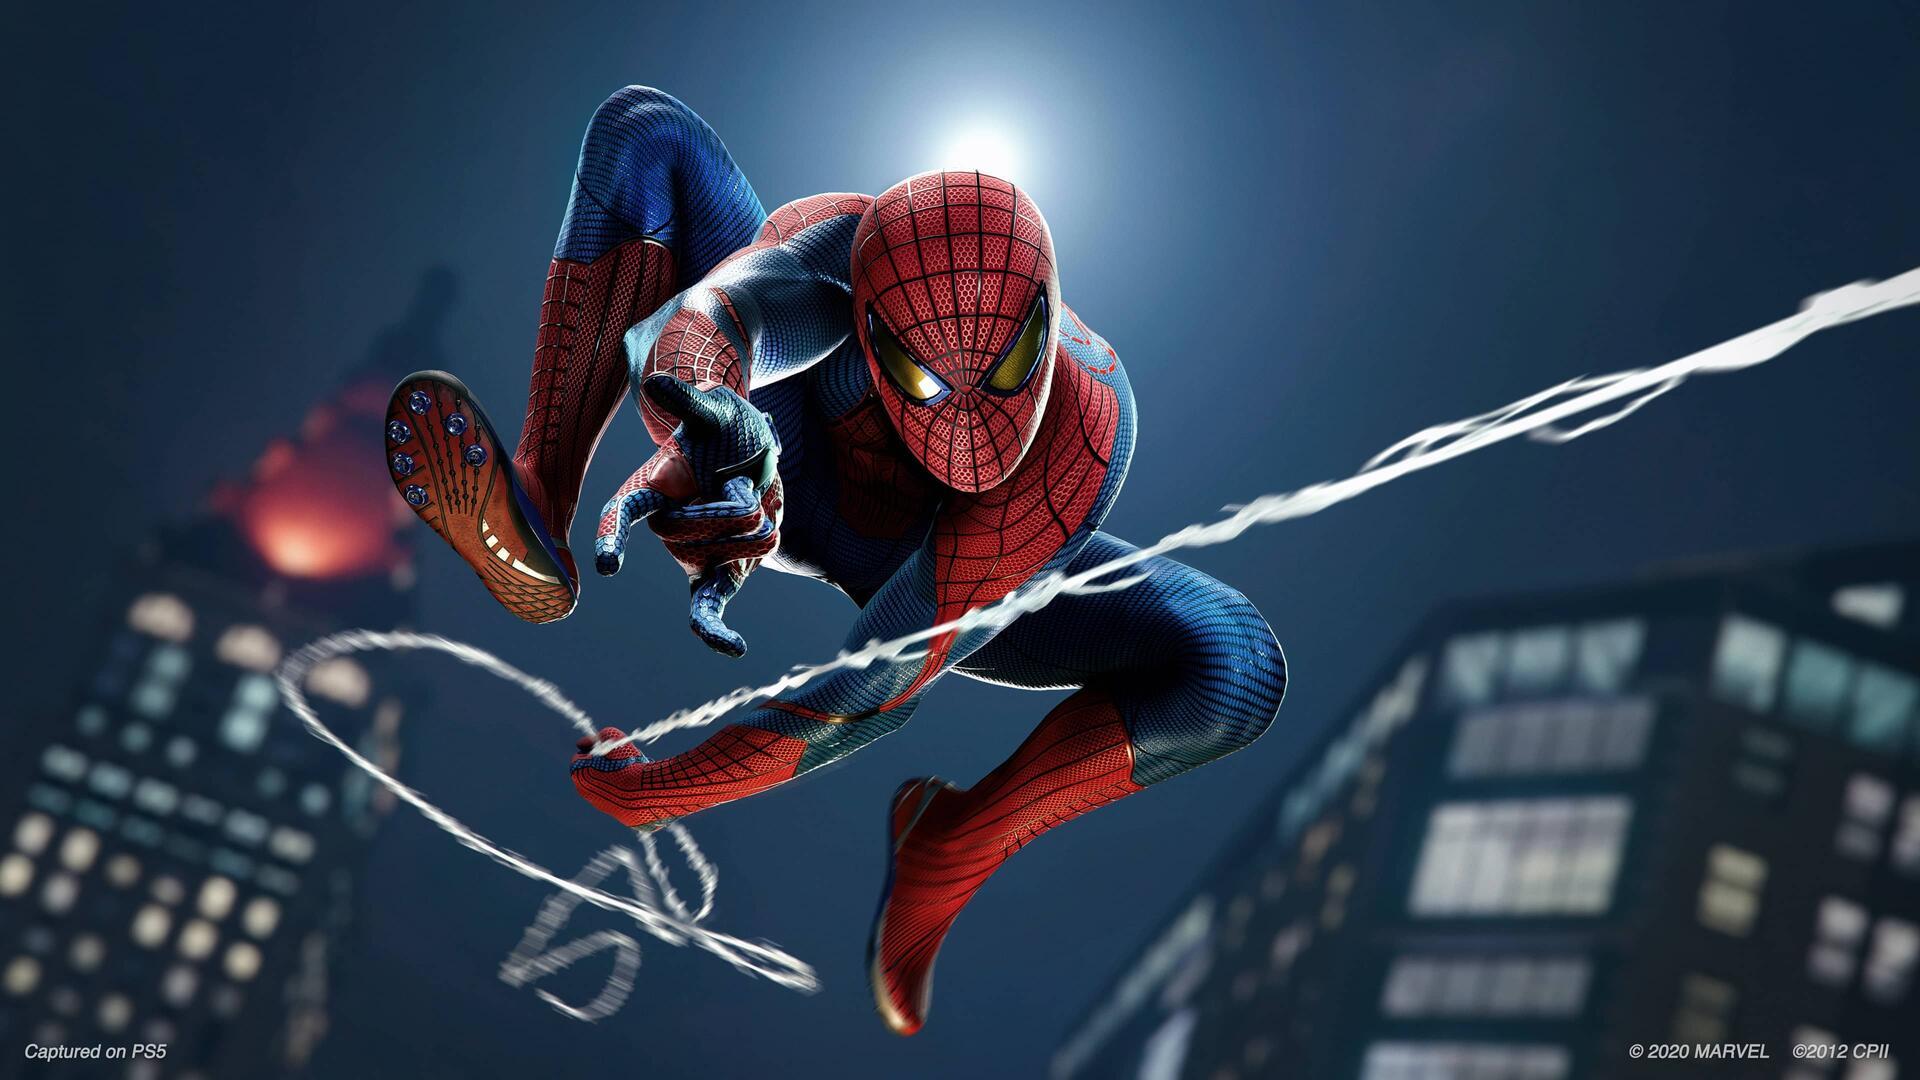 Spiderman:Remastered